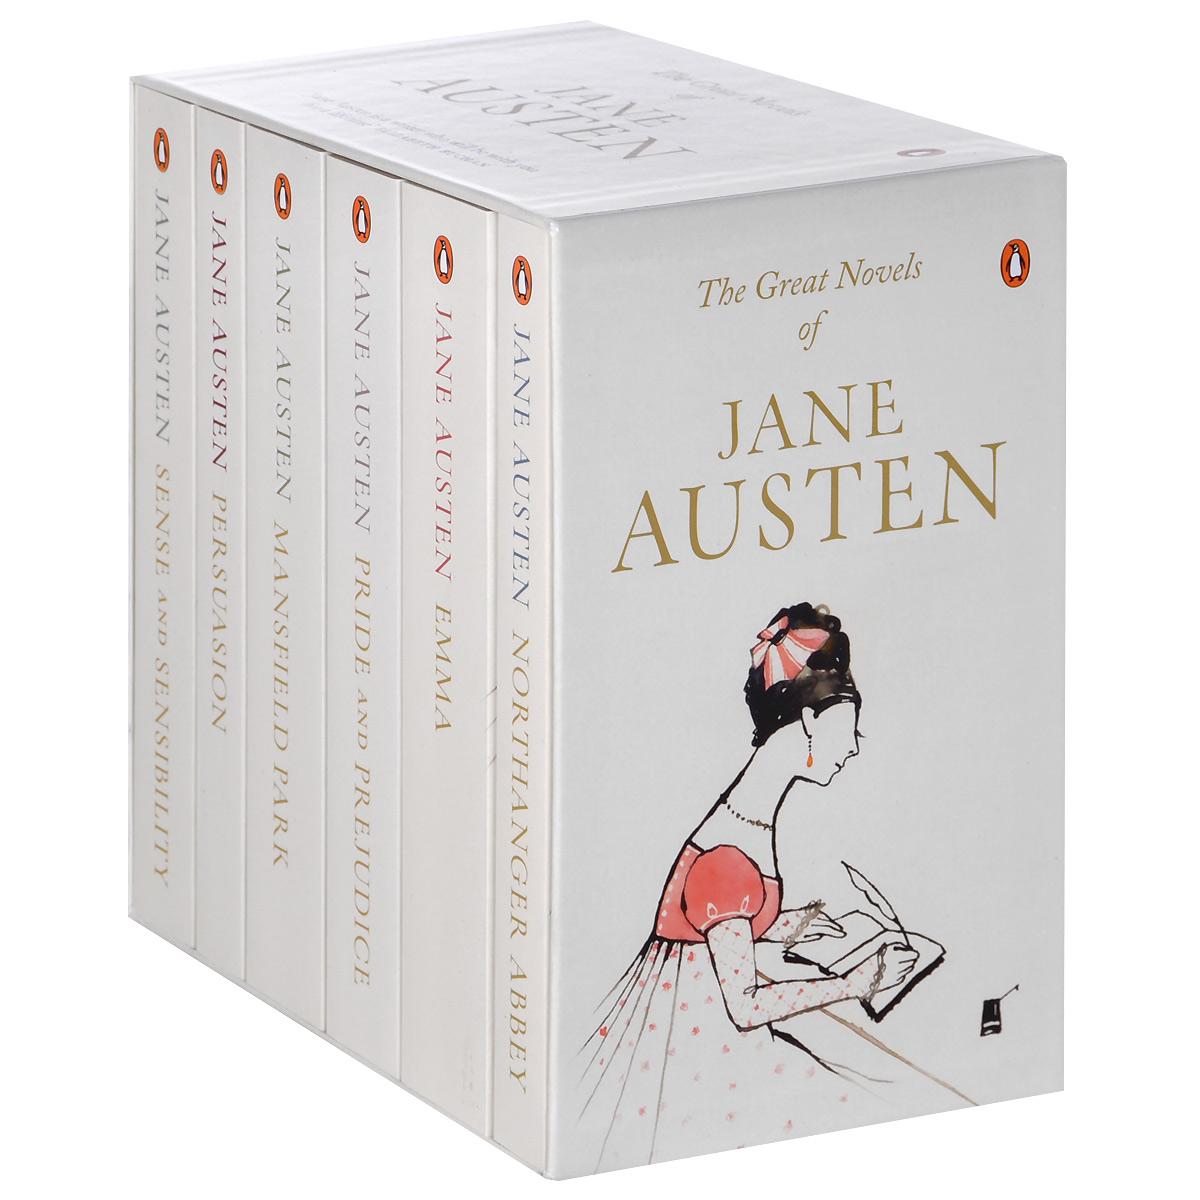 The Great Novels of Jane Austen (комплект из 6 книг) the complete novels of jane austen volume i